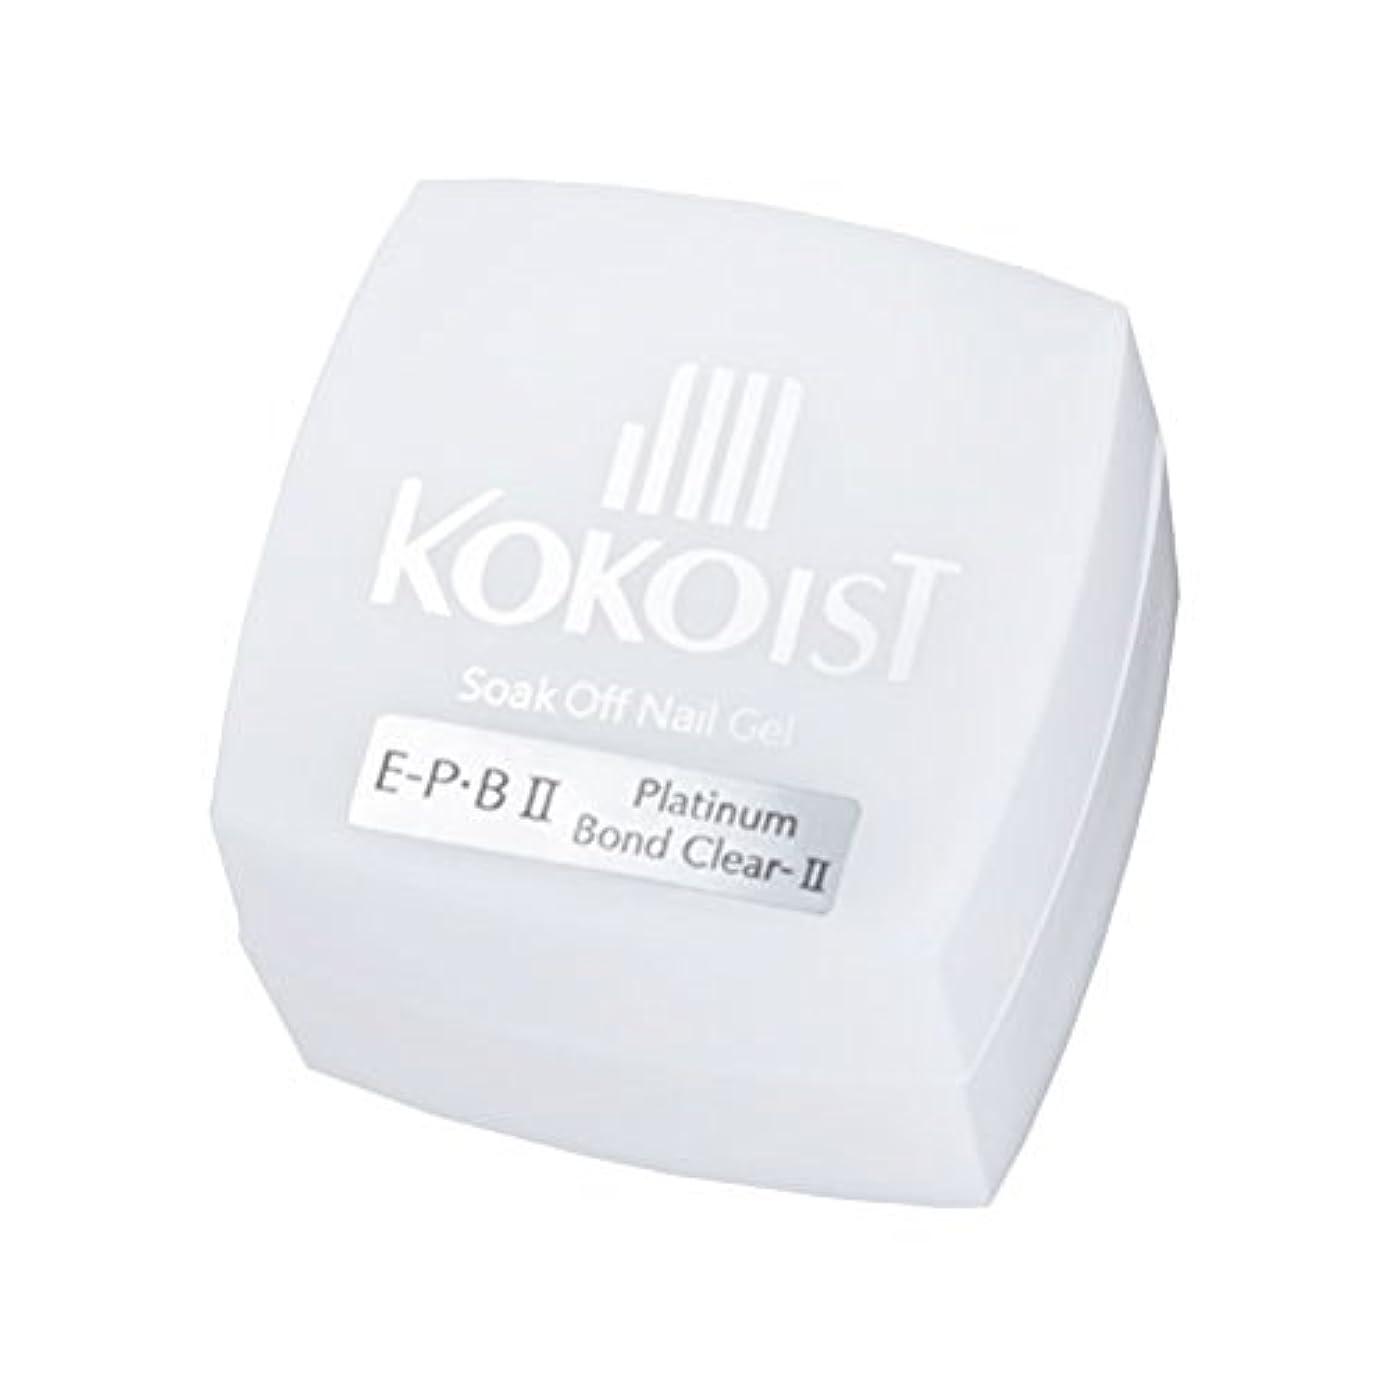 KOKOIST フ゜ラチナホ゛ント゛II 4g ジェル UV/LED対応